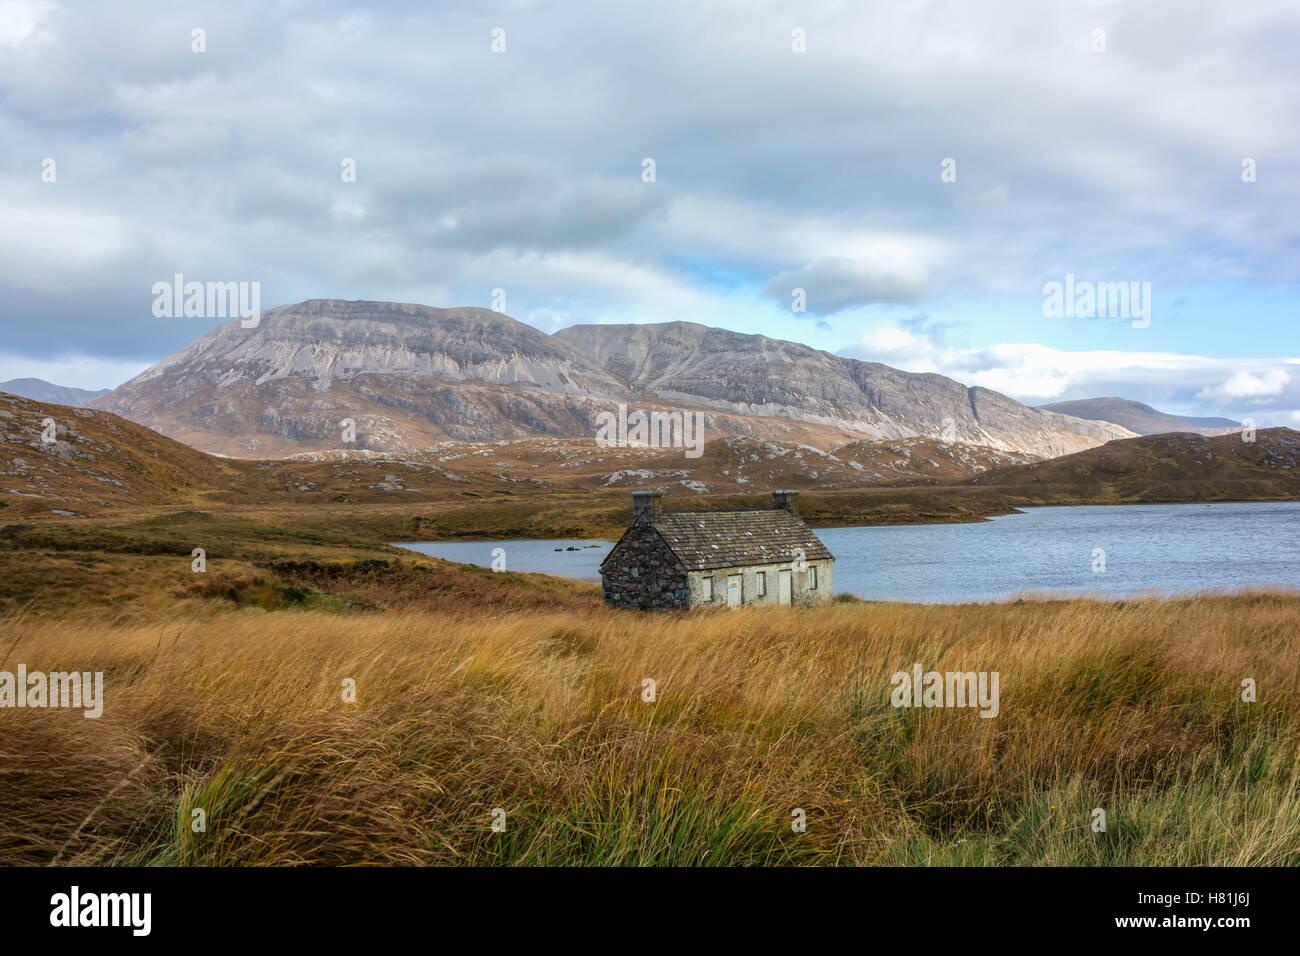 Loch Stack and Ben Arkle, Sutherland, Scotland, United Kingdom Stock Photo